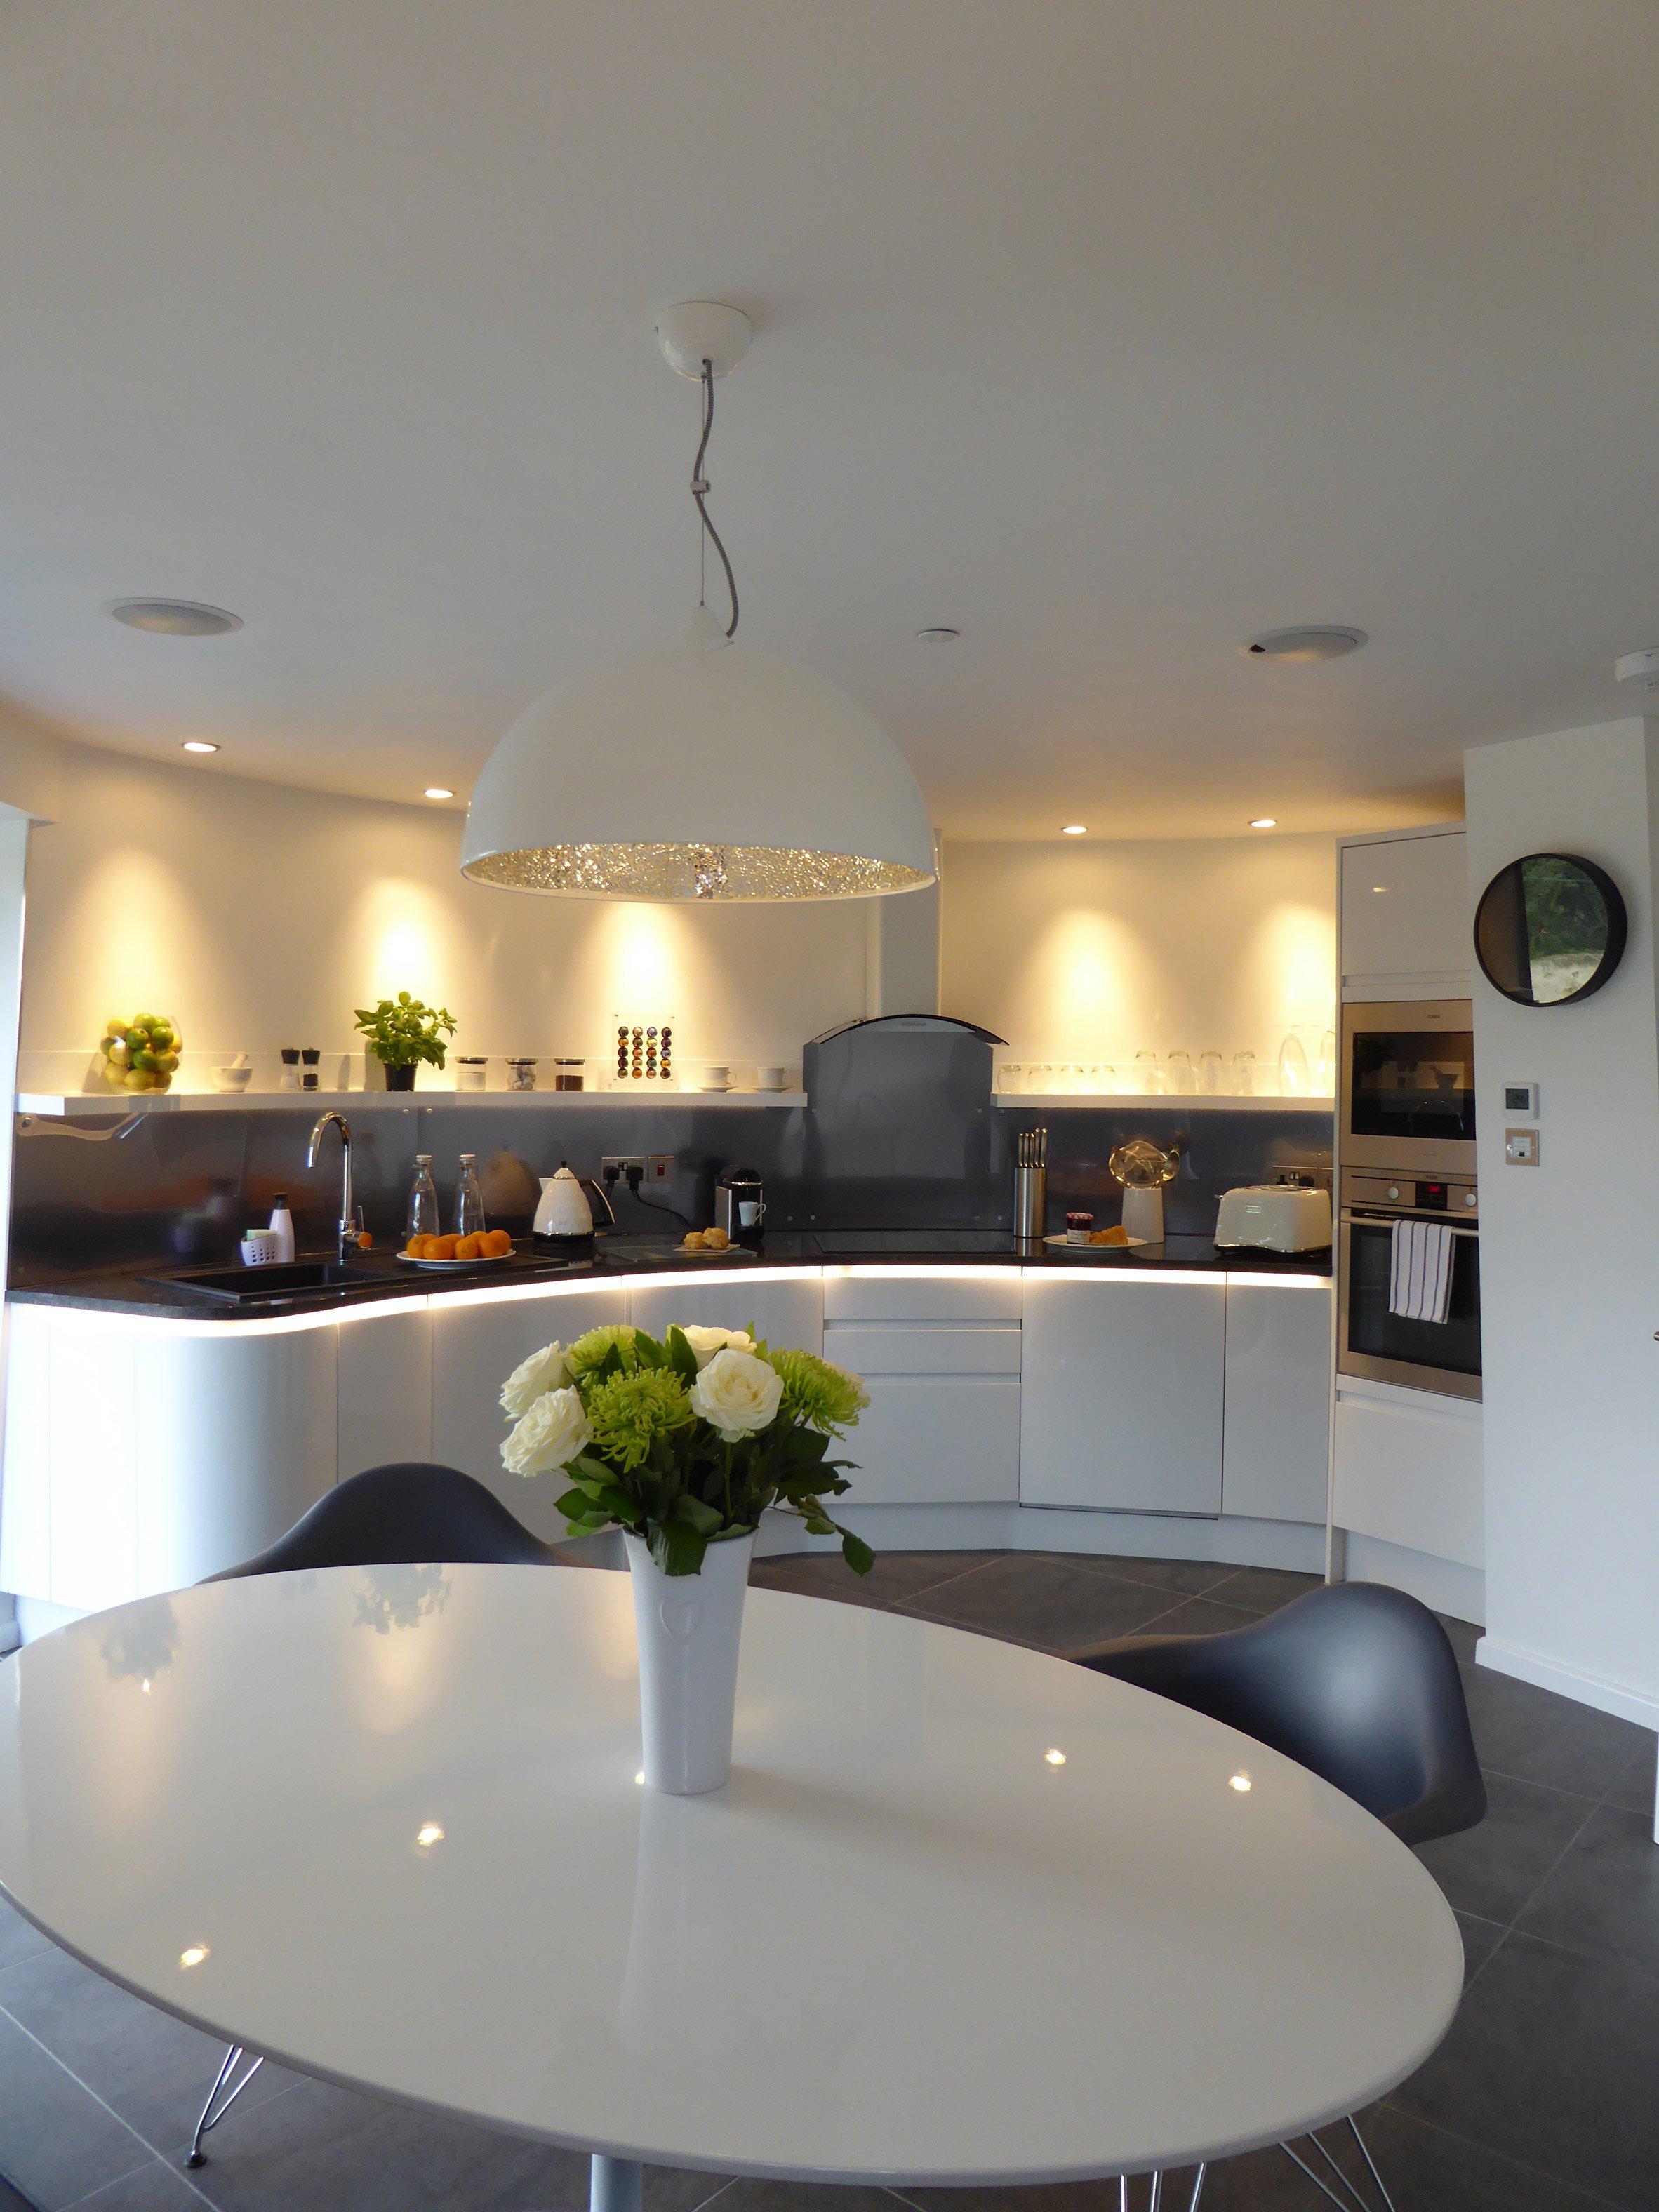 La cucina/sala da pranzo / Beech Arquitects